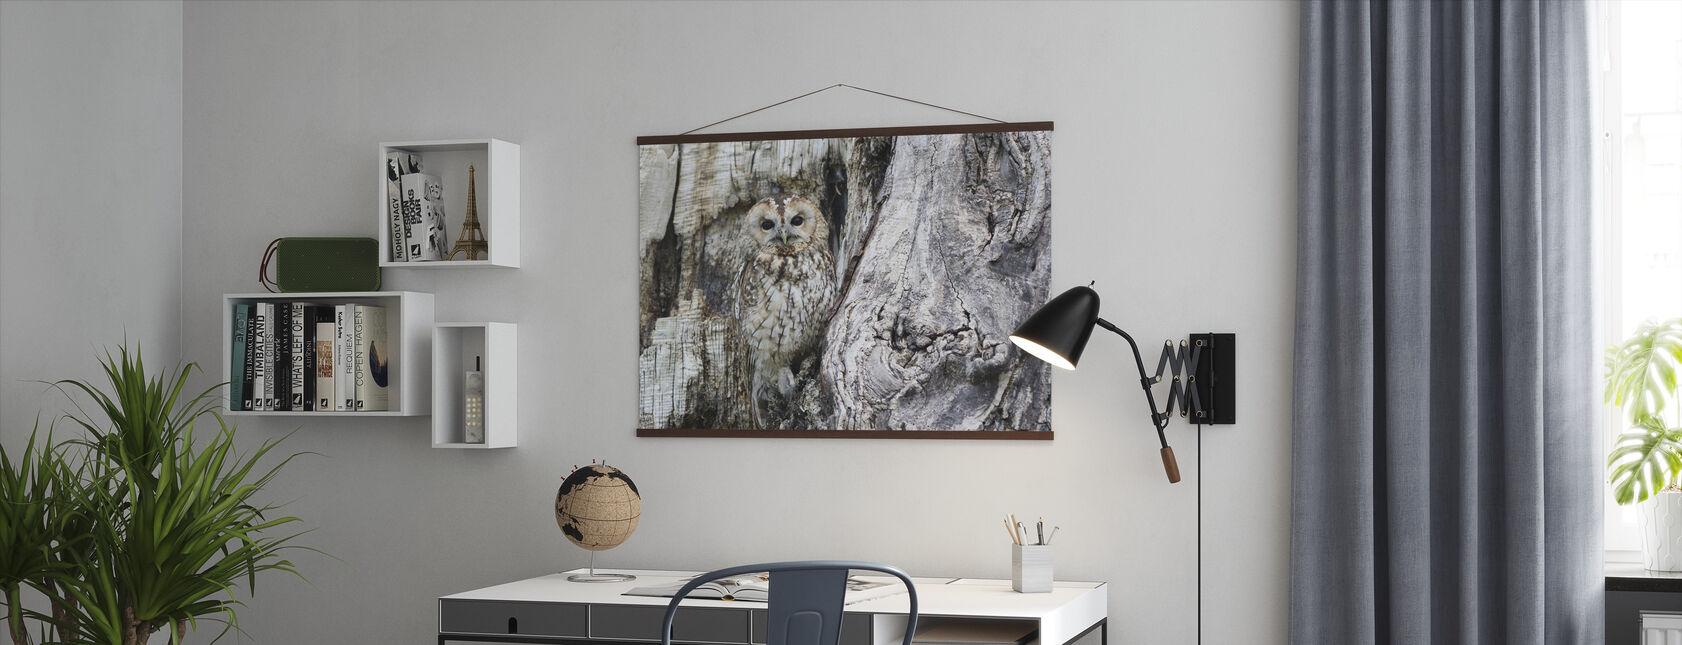 Camouflage ugle - Plakat - Kontor